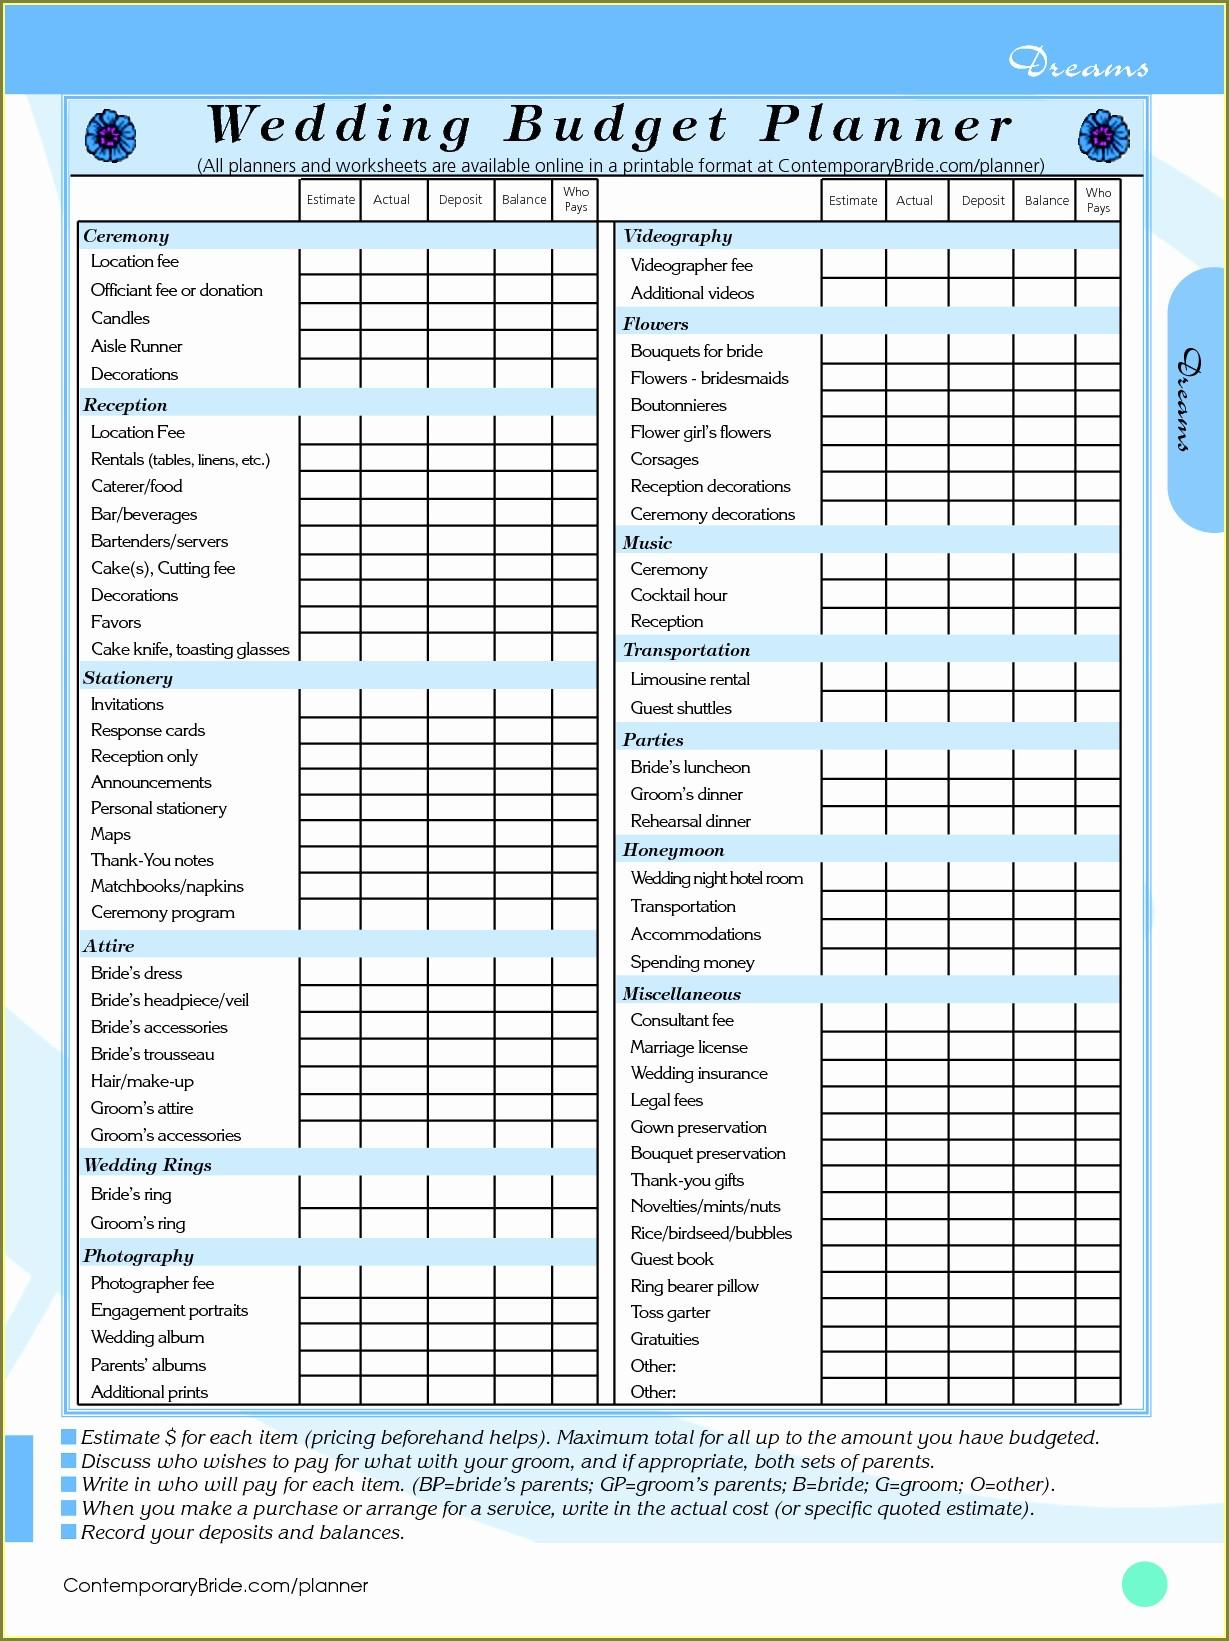 Home Budget Planner Spreadsheet